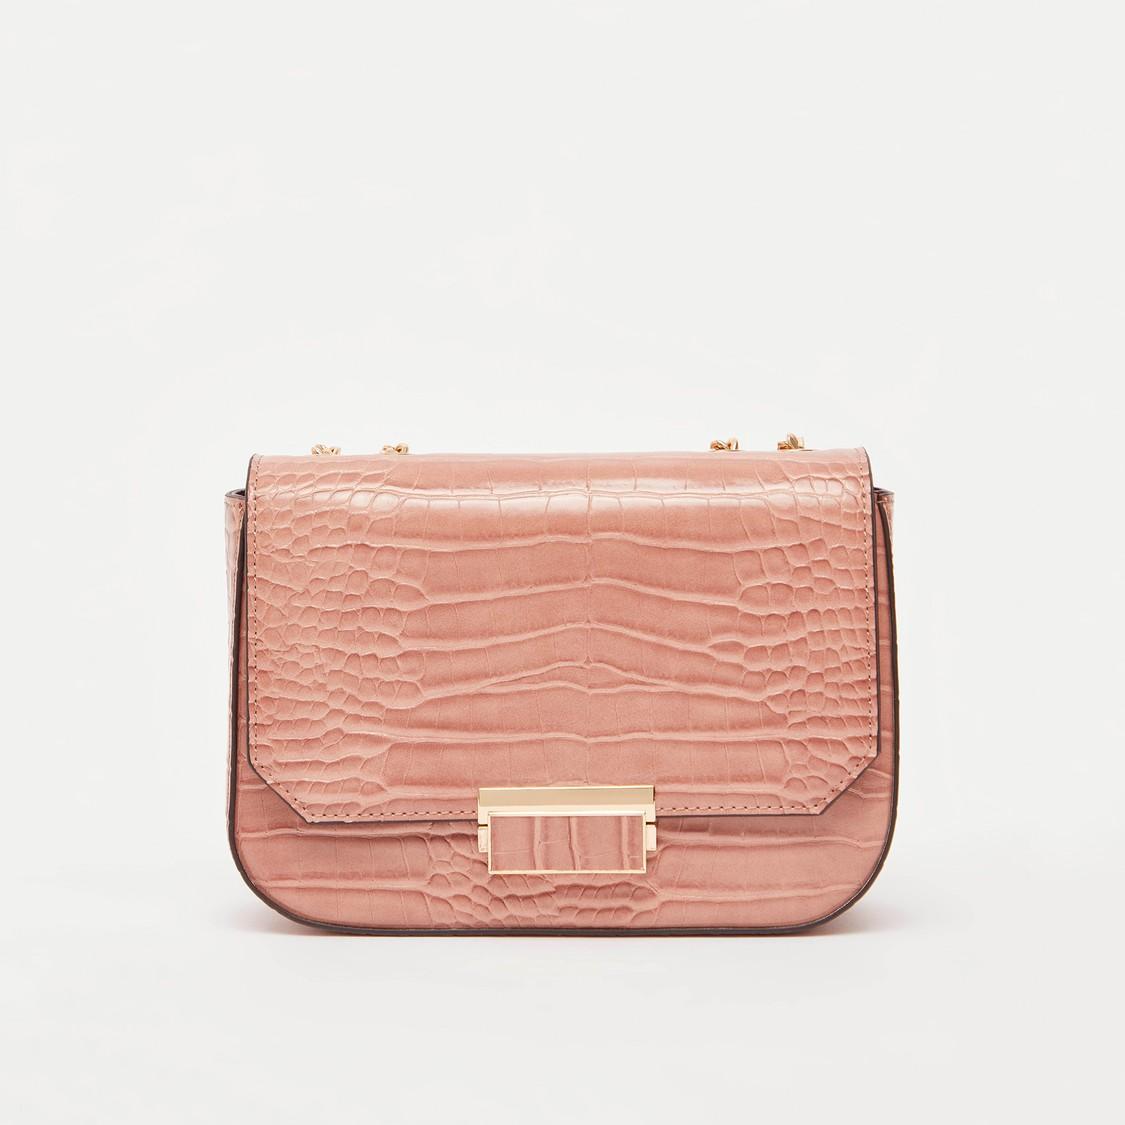 Textured Satchel Bag with Shoulder Chain and Zip Closure